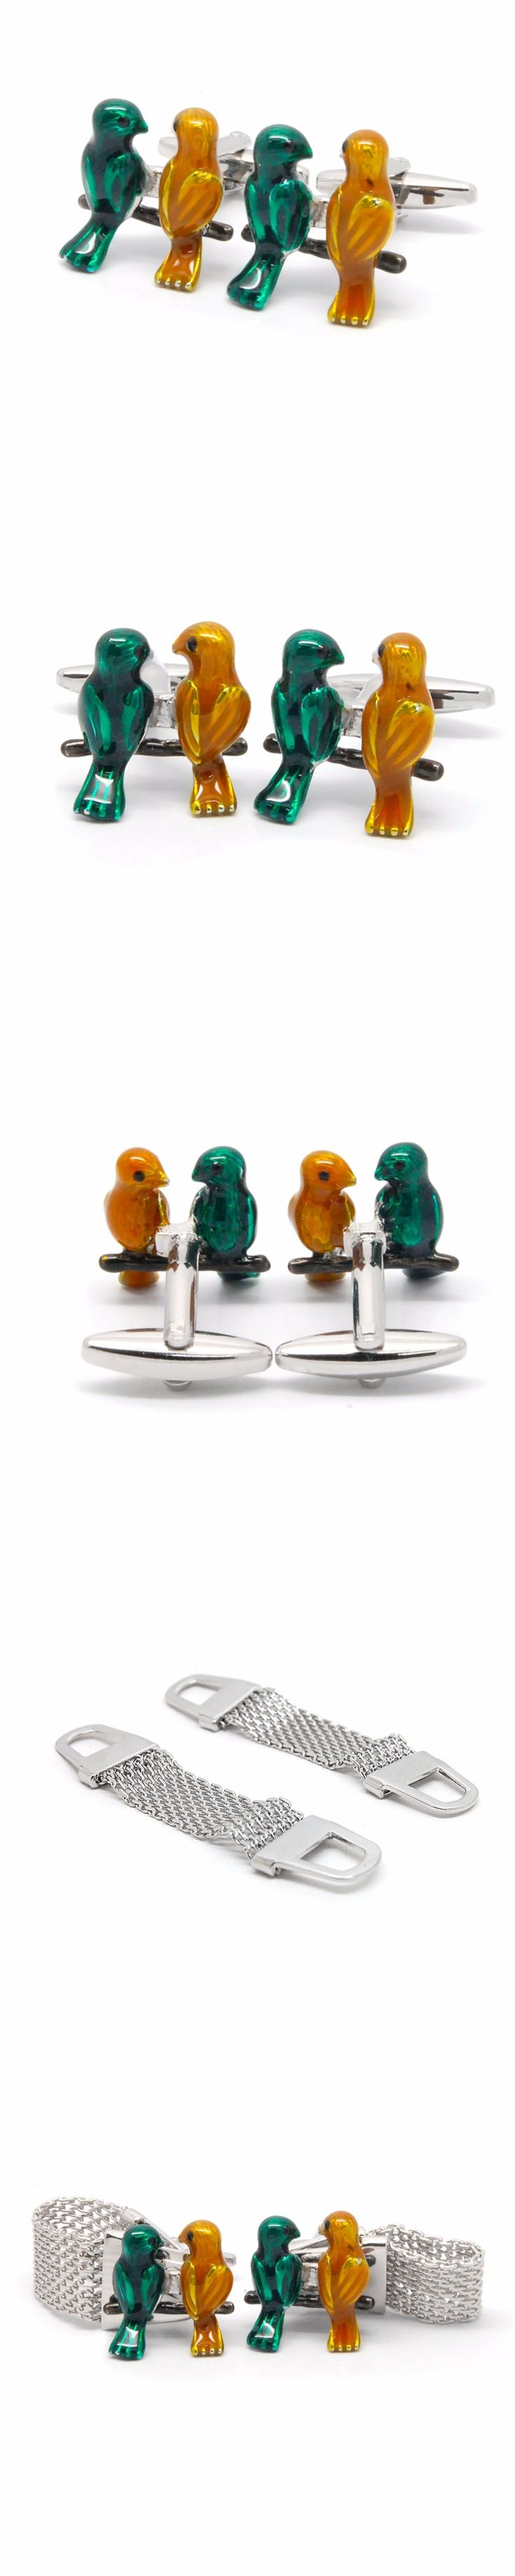 Animal Parrot Cufflinks For Mens Fashion Novel Copper Cufflink High Quality French Shirt Cuff Links Wedding Groom Gift